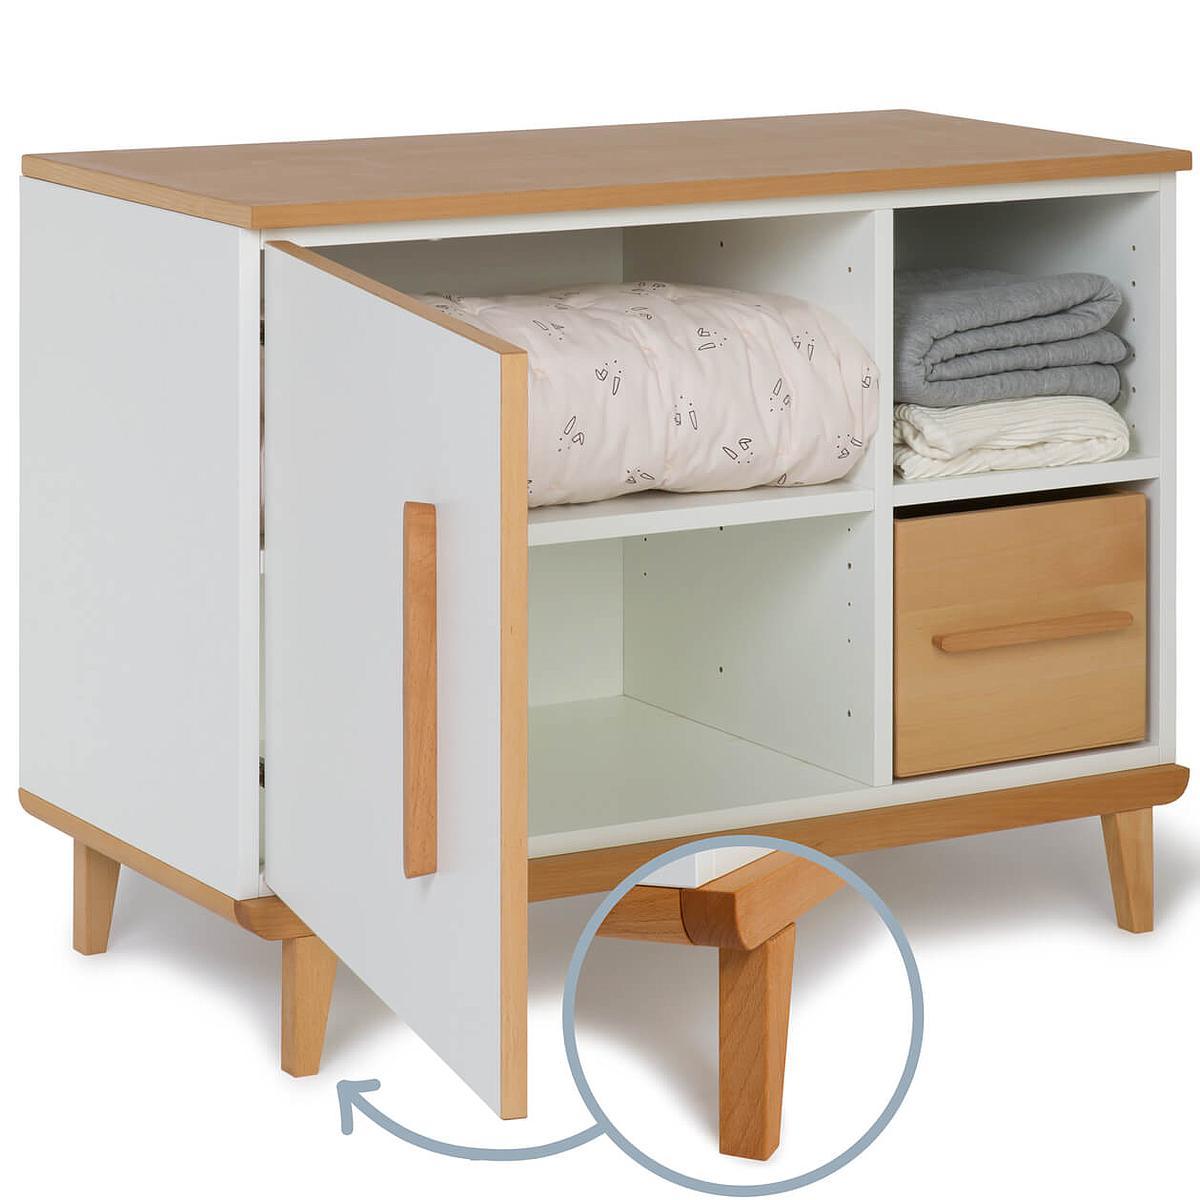 Mueble pequeño 1 puerta NADO white